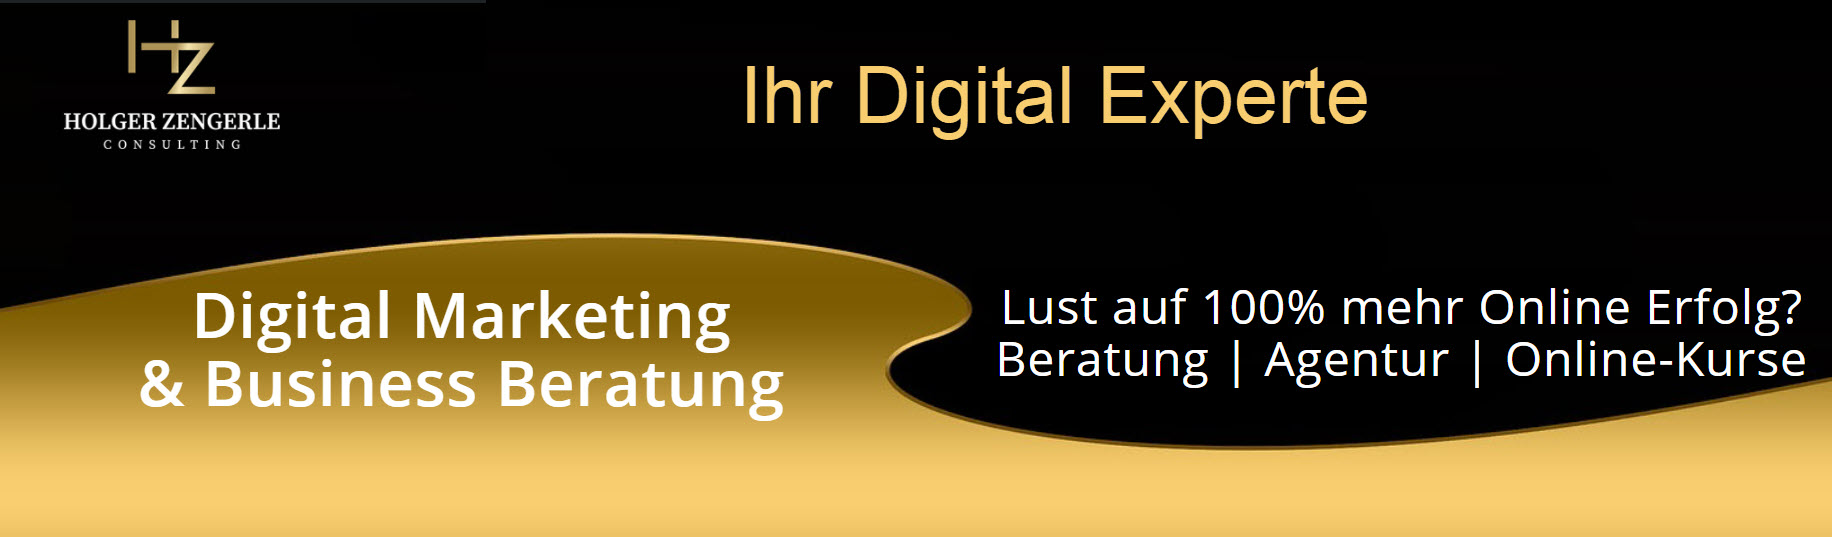 digital-aufgeladen-zengerle.jpg – Zengerle-Consulting  - Digital Experte